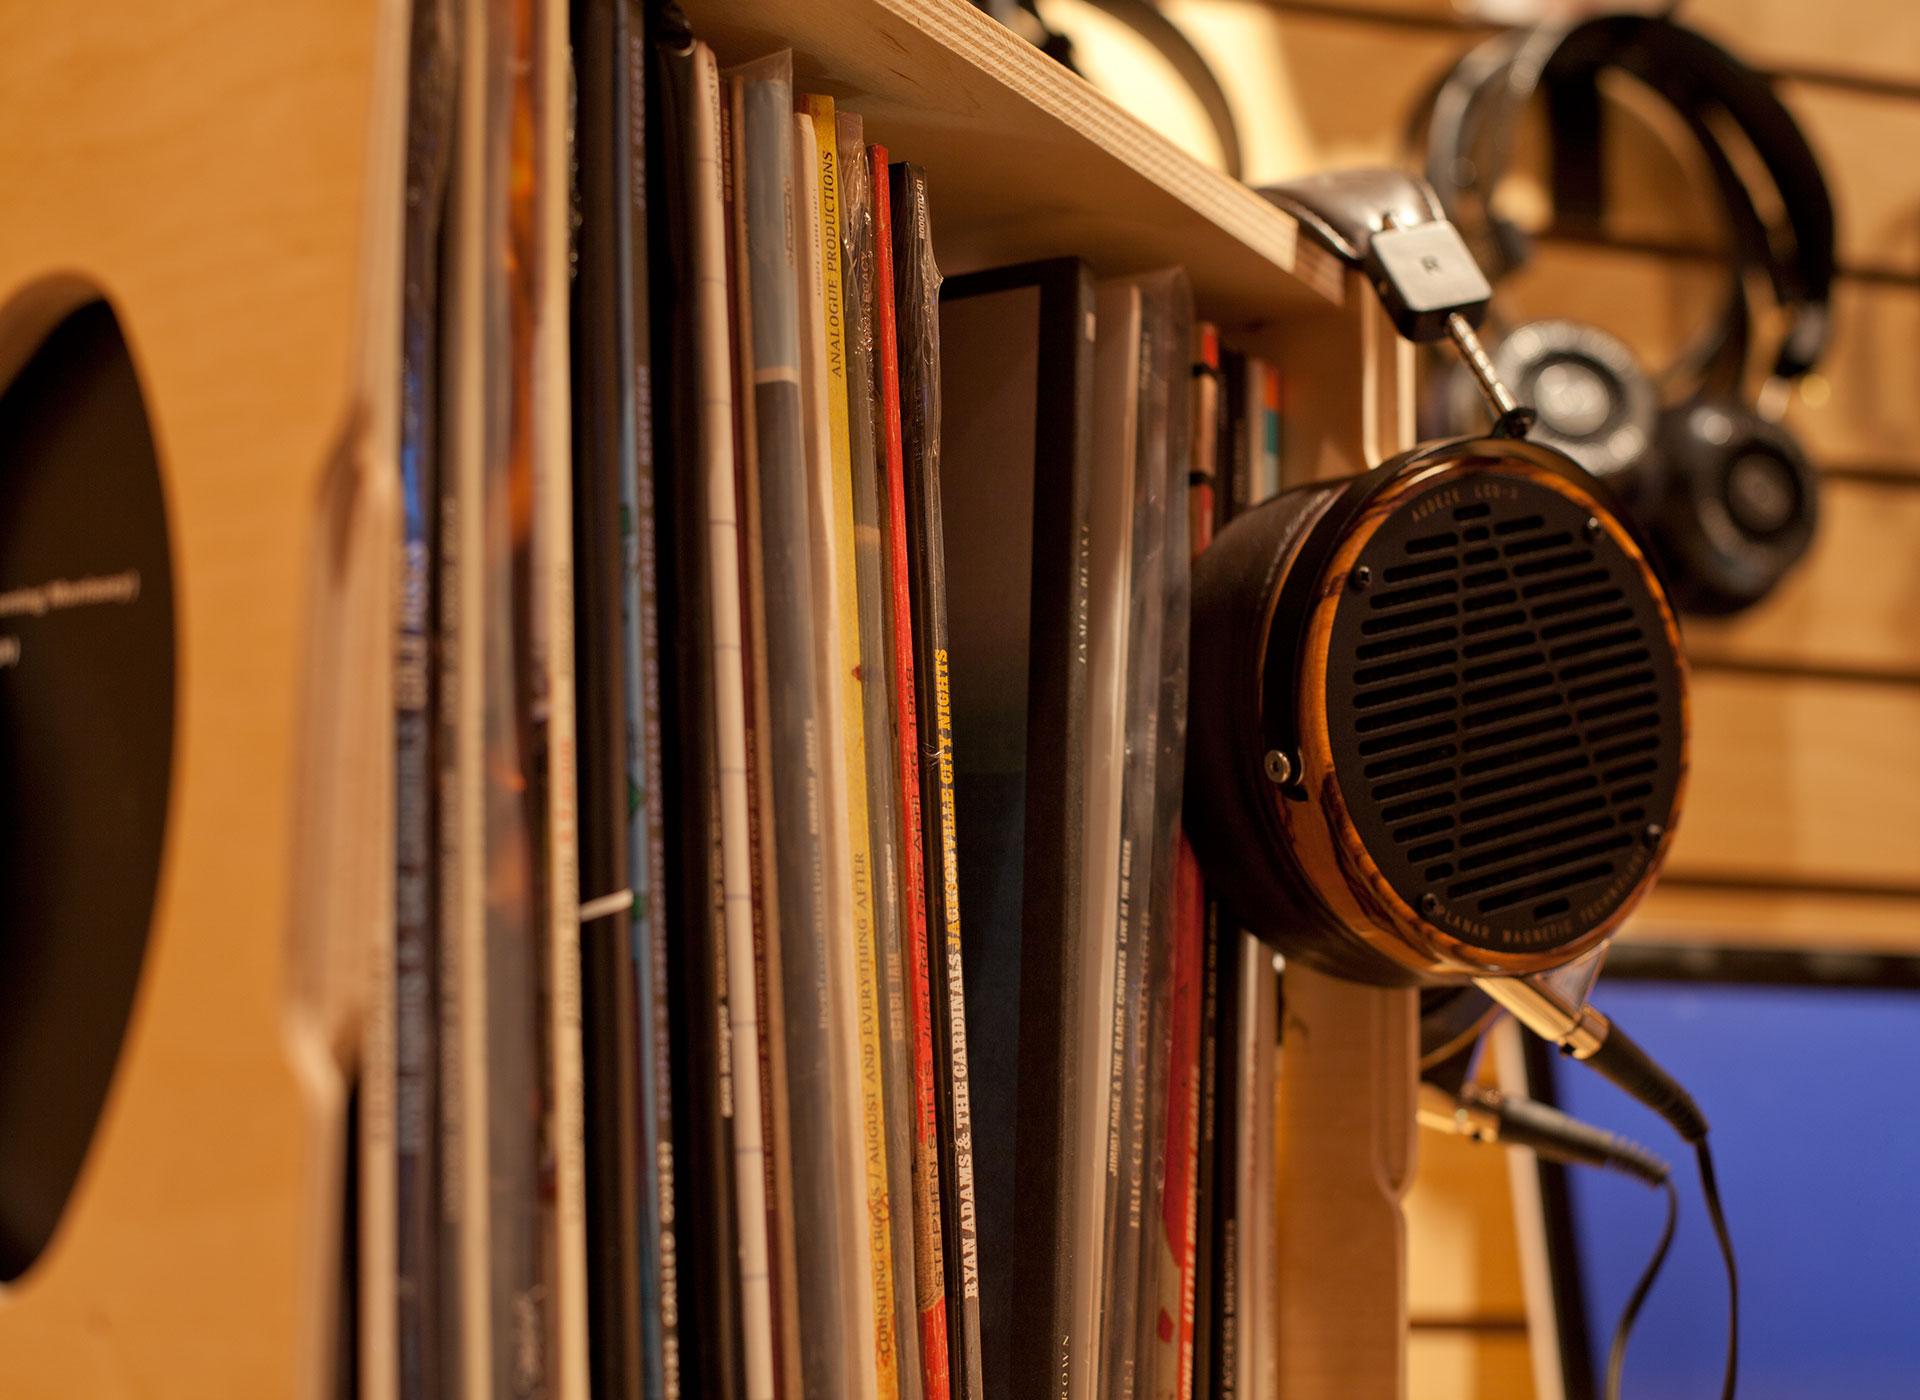 Audeze-and-Vinyl-Record-Crate